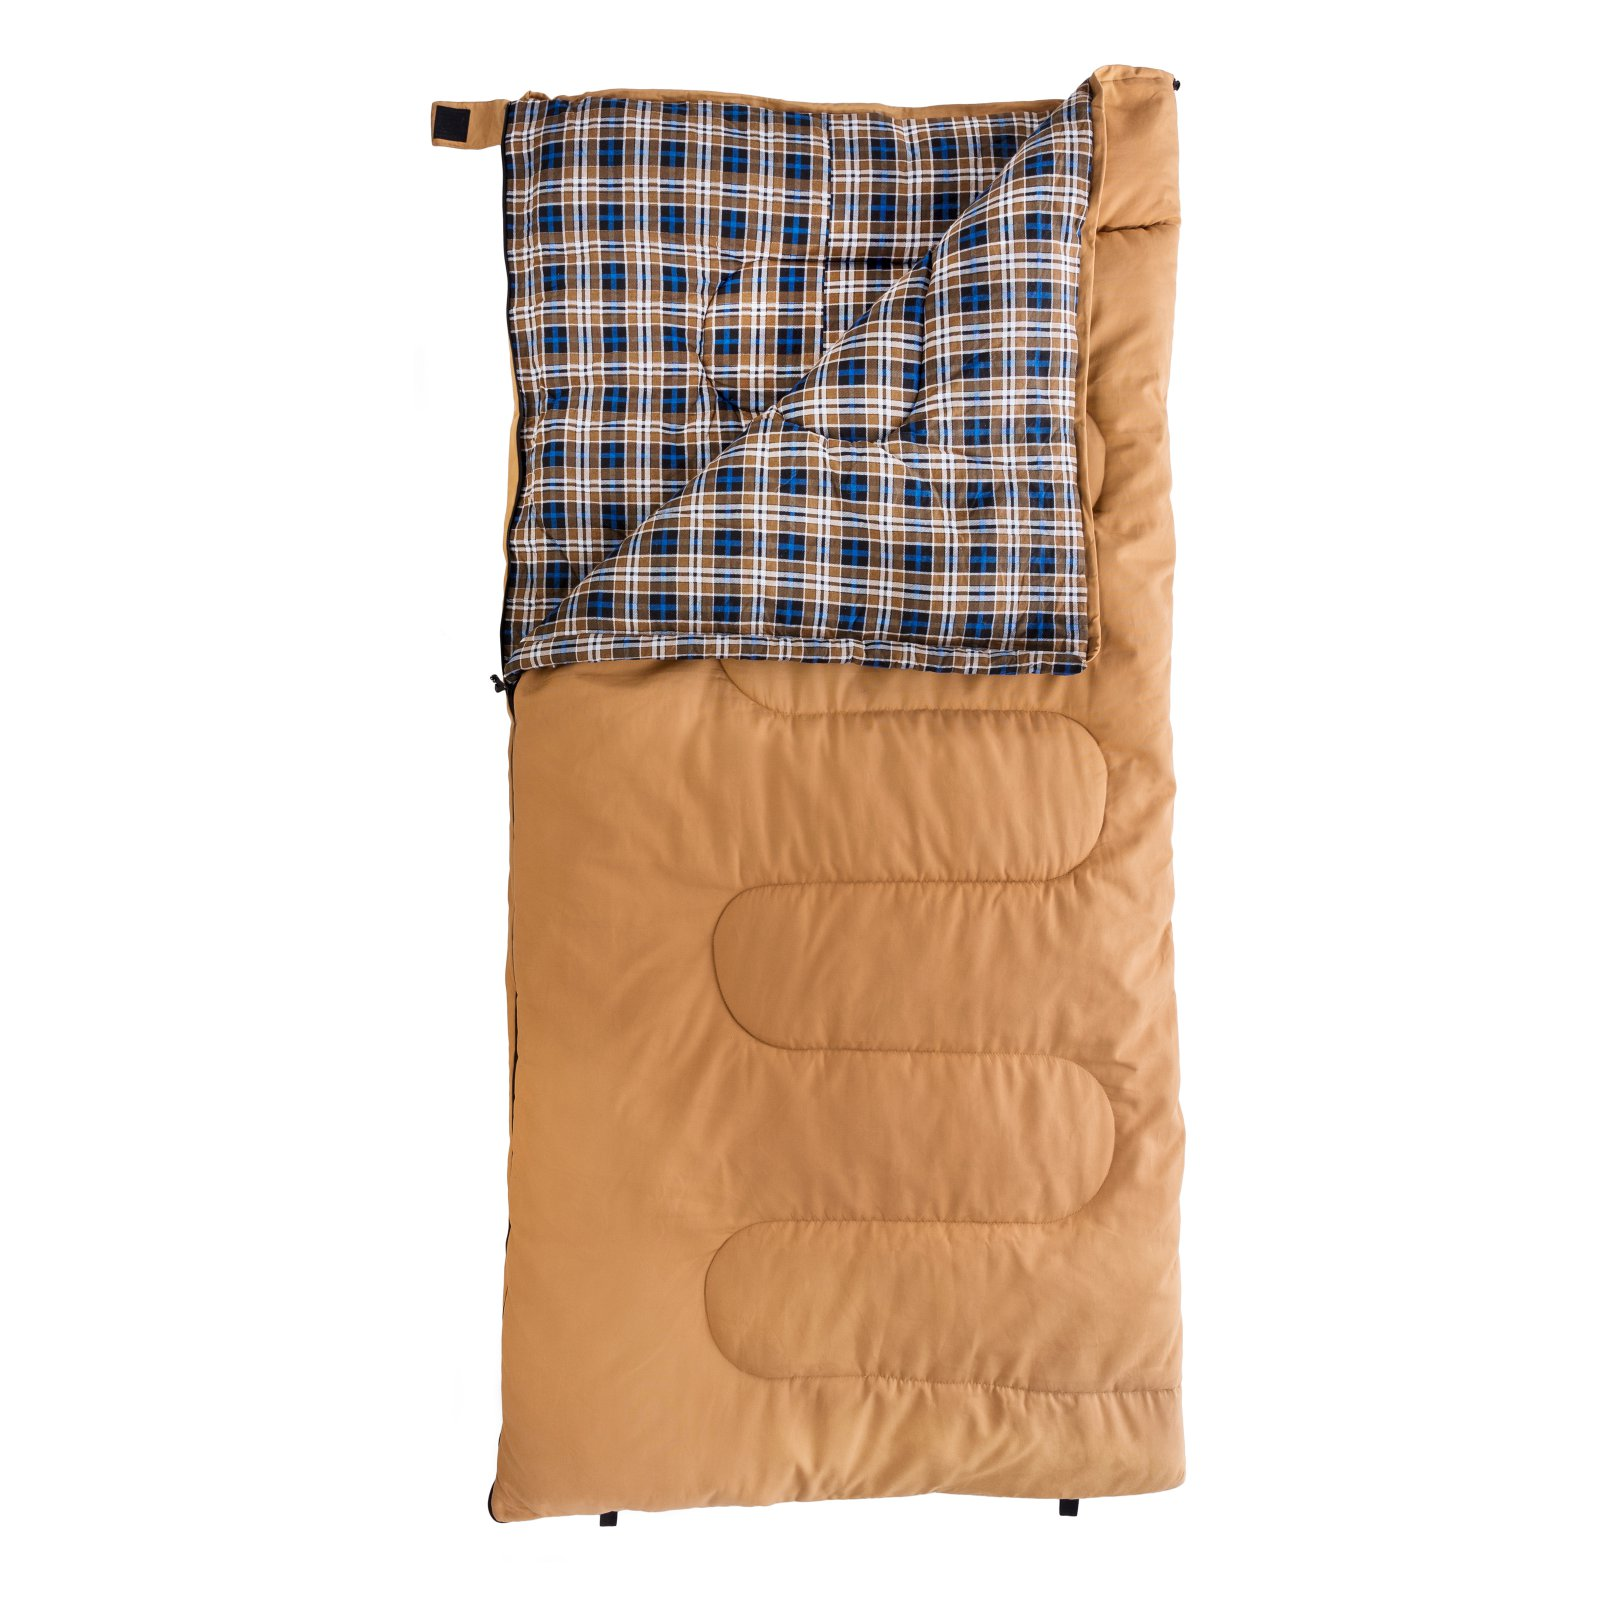 Kamp-Rite Woods Ultra 15 Degree Sleeping Bag